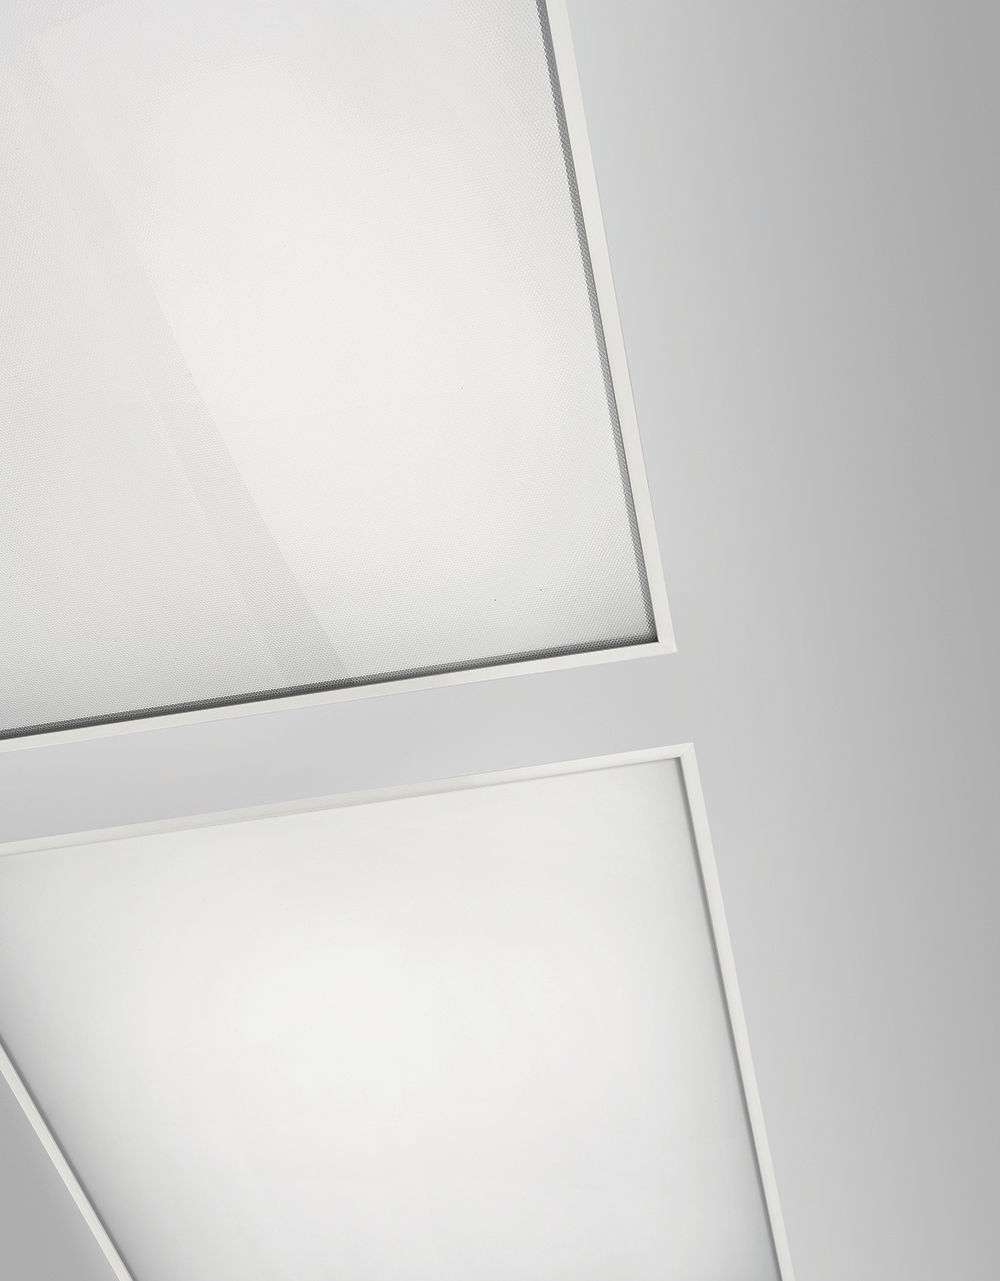 Recessed ceiling light fixture / LED / square / extruded aluminum ABSENT Esse-ci ... & Recessed ceiling light fixture / LED / square / extruded aluminum ... azcodes.com